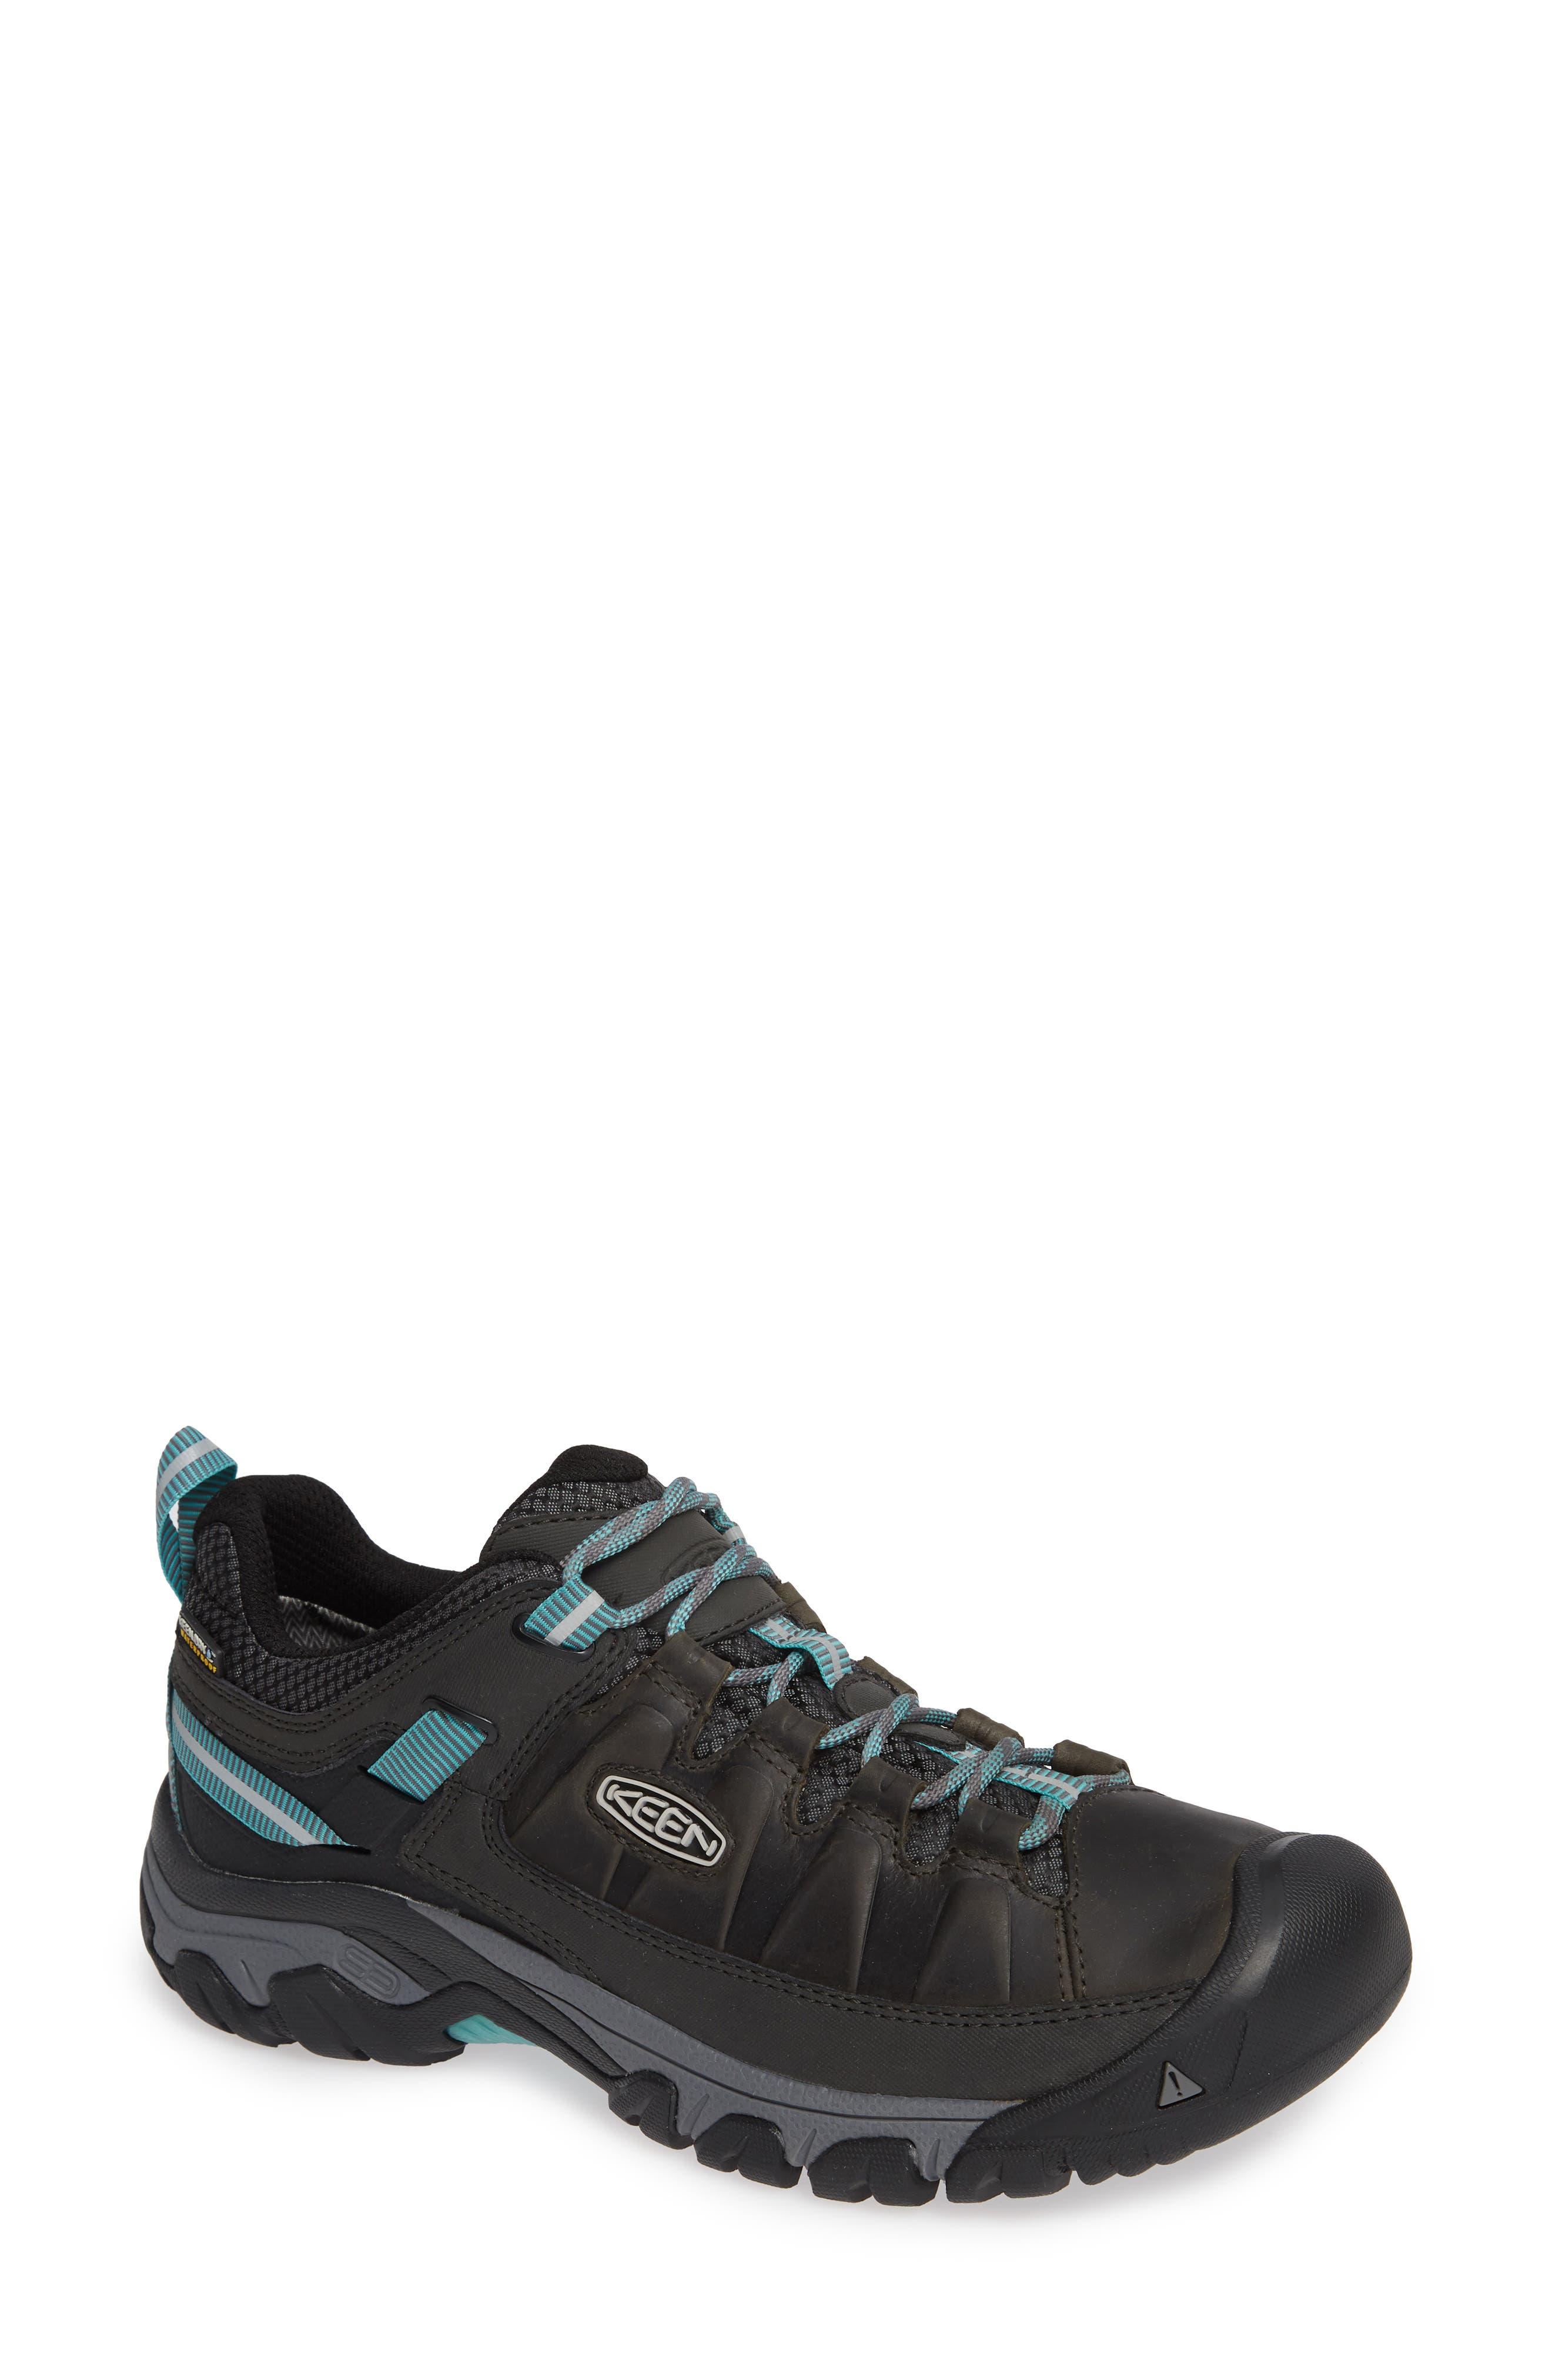 Targhee III Waterproof Hiking Shoe,                             Main thumbnail 1, color,                             ALCATRAZ/ TURQUOISE LEATHER